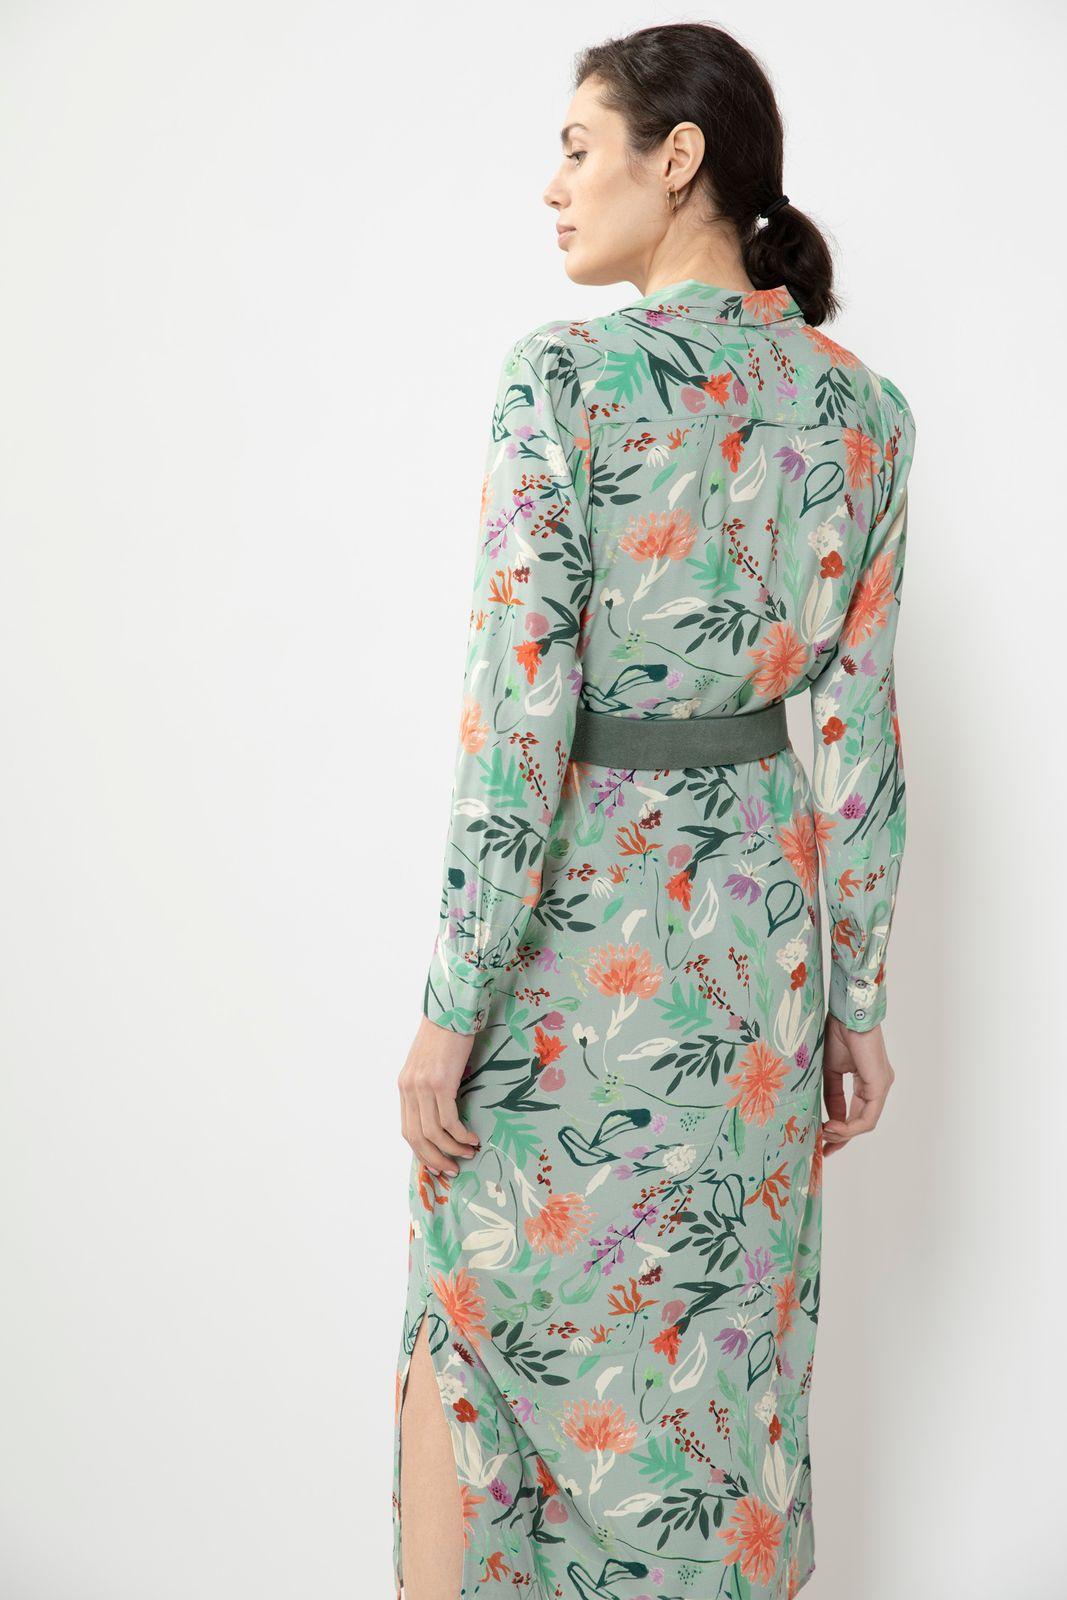 Multicolor maxi jurk met all over bloemenprint